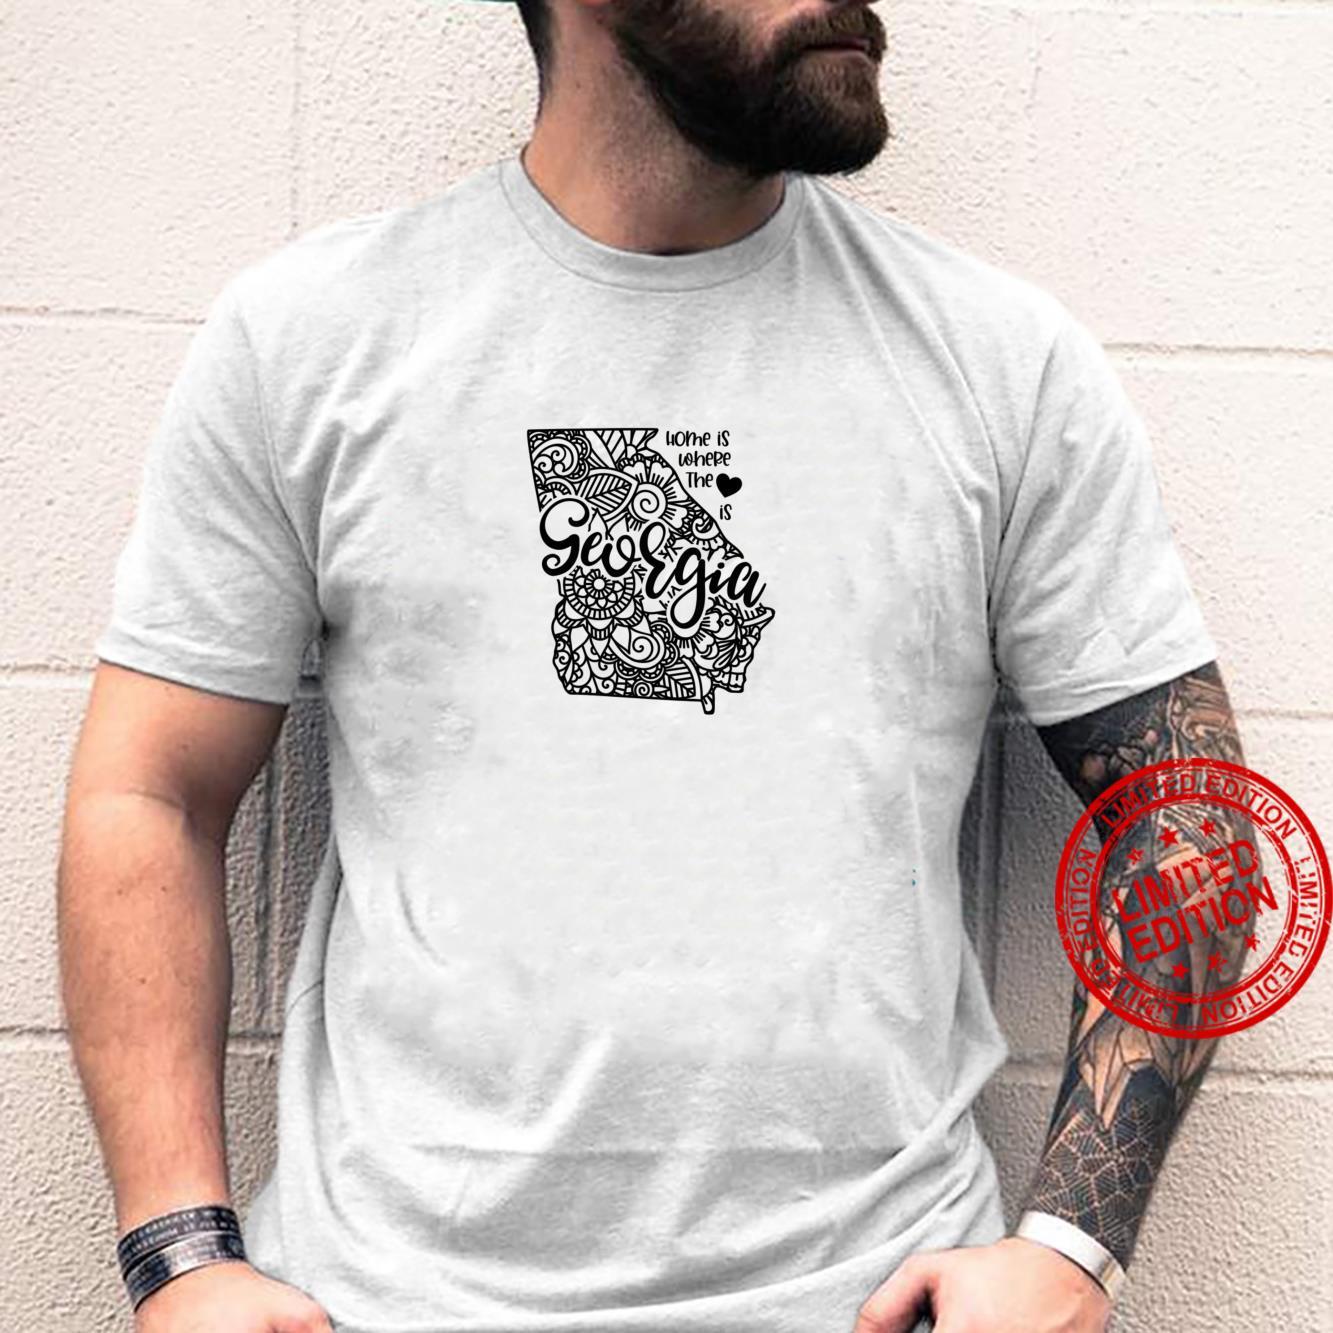 Georgia State Meme With Line Art Shirt